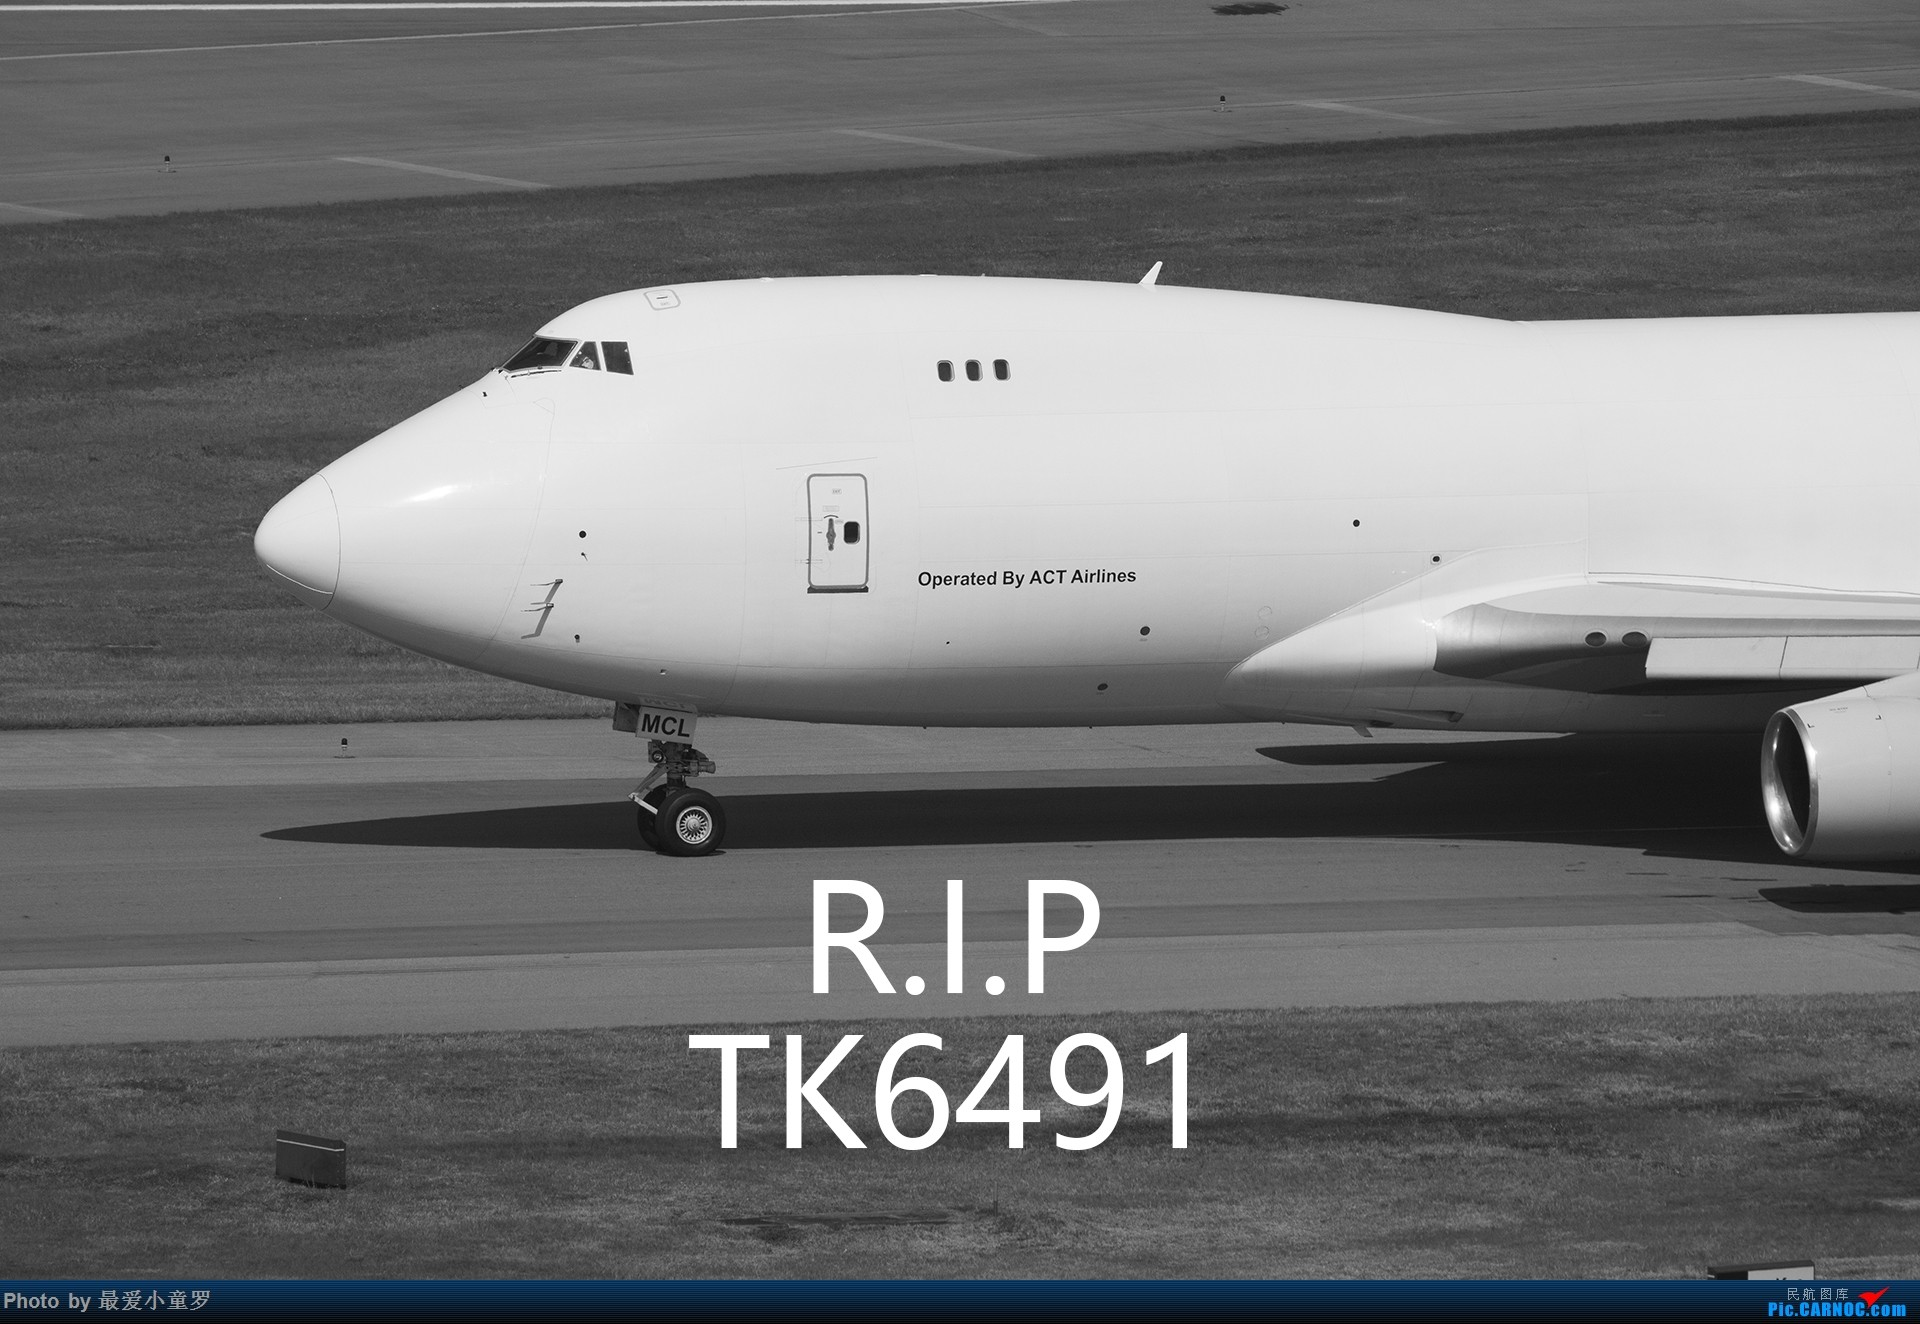 Re:[原创]2013-2018,系列组图纪念拍机5周年 BOEING 747-400 TC-MCL 中国香港国际机场